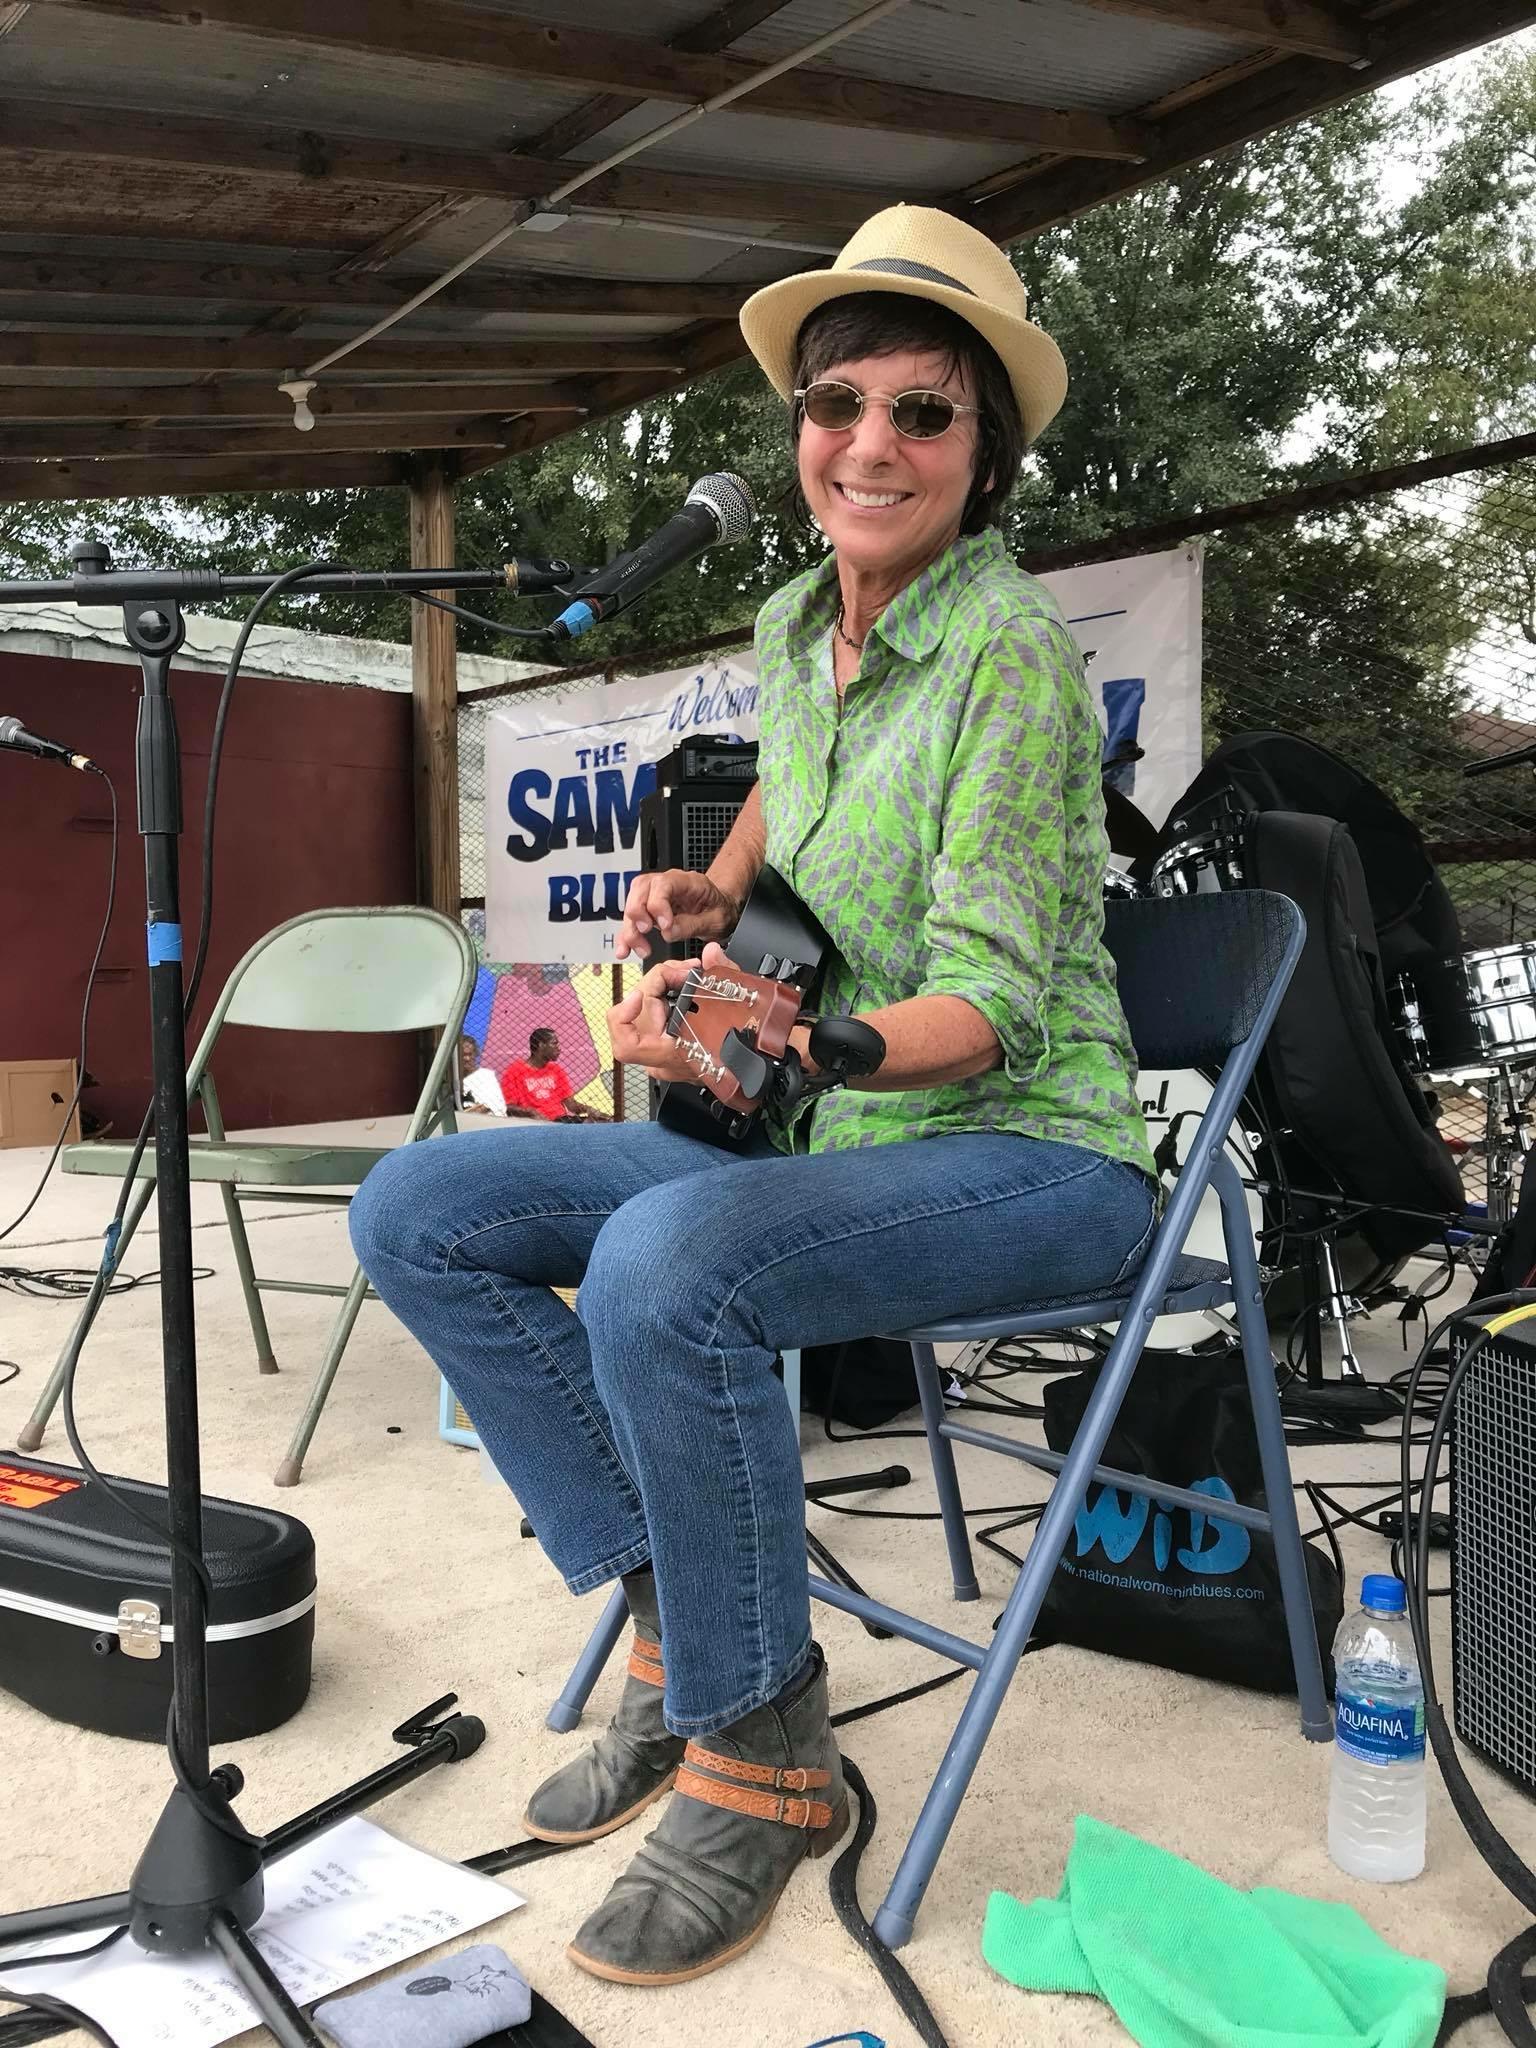 Sam Chatmon Blues Festival 2018 Hollandale, MS photo by Euphus Ruth